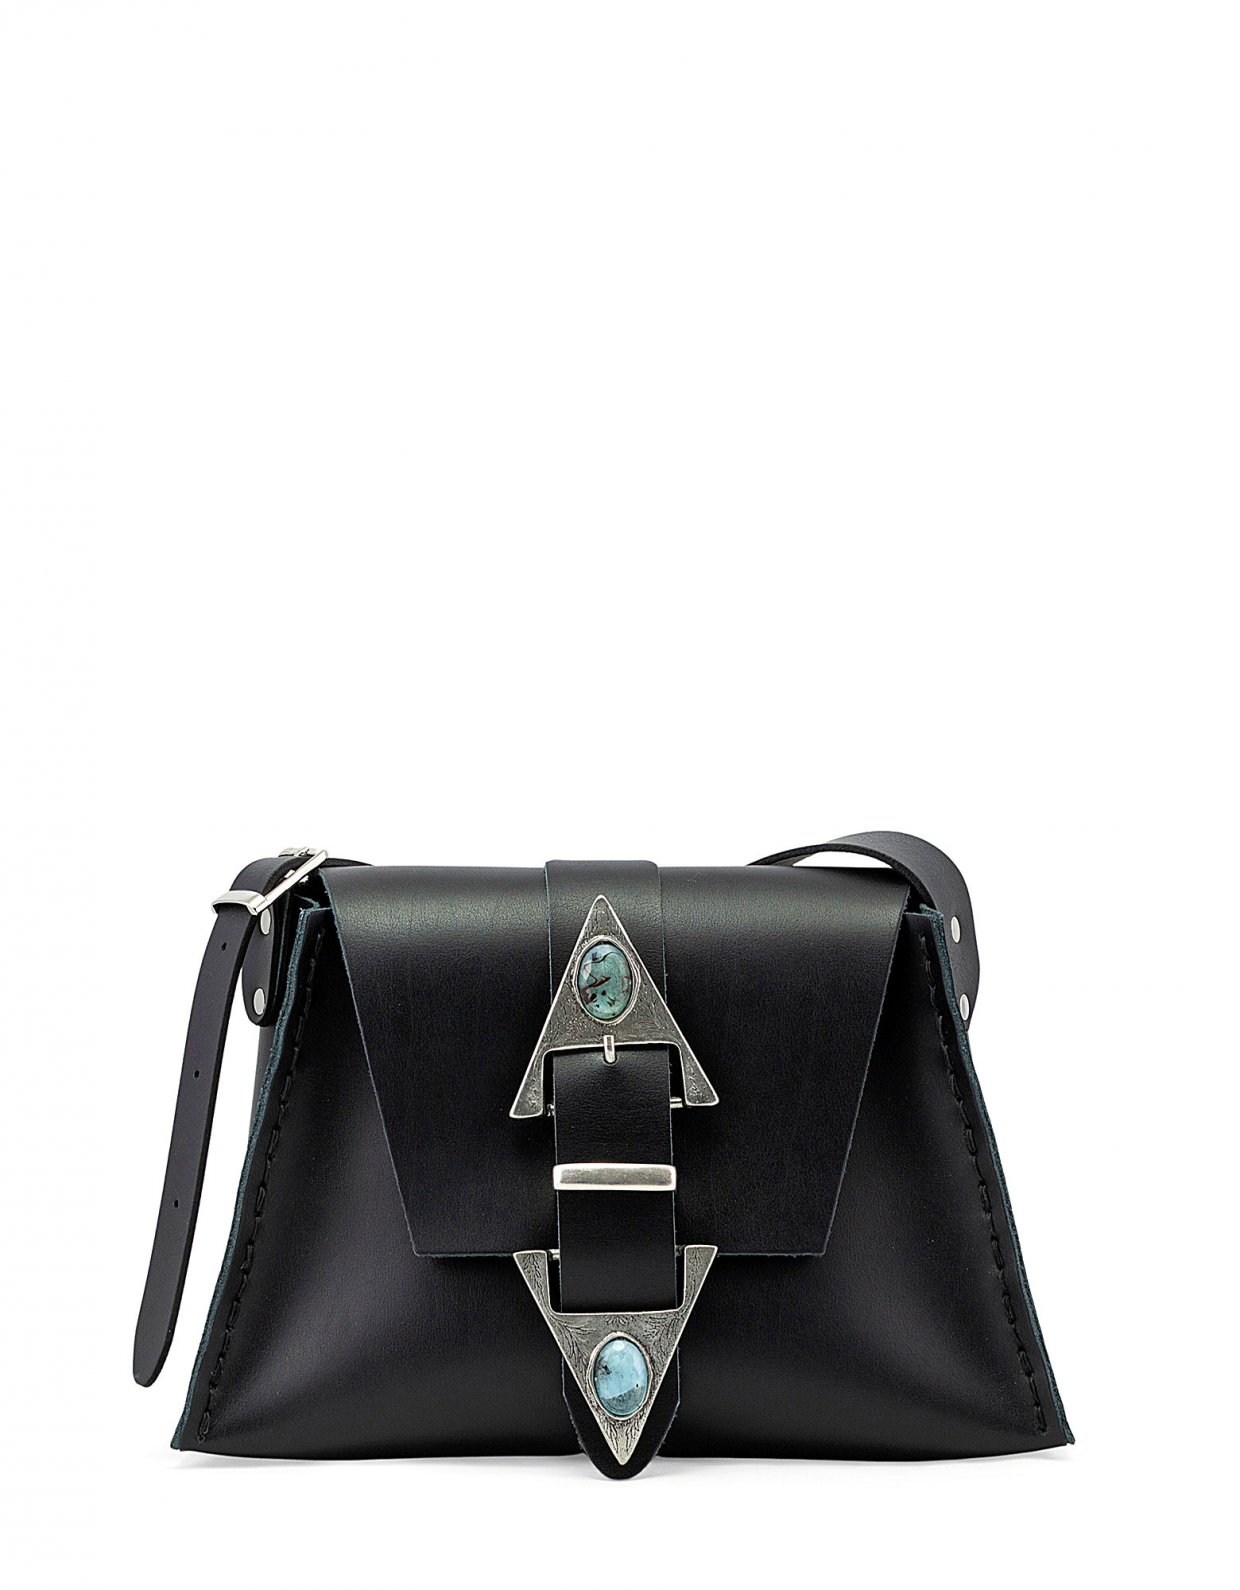 Individual Art Leather Dance monkey bag black